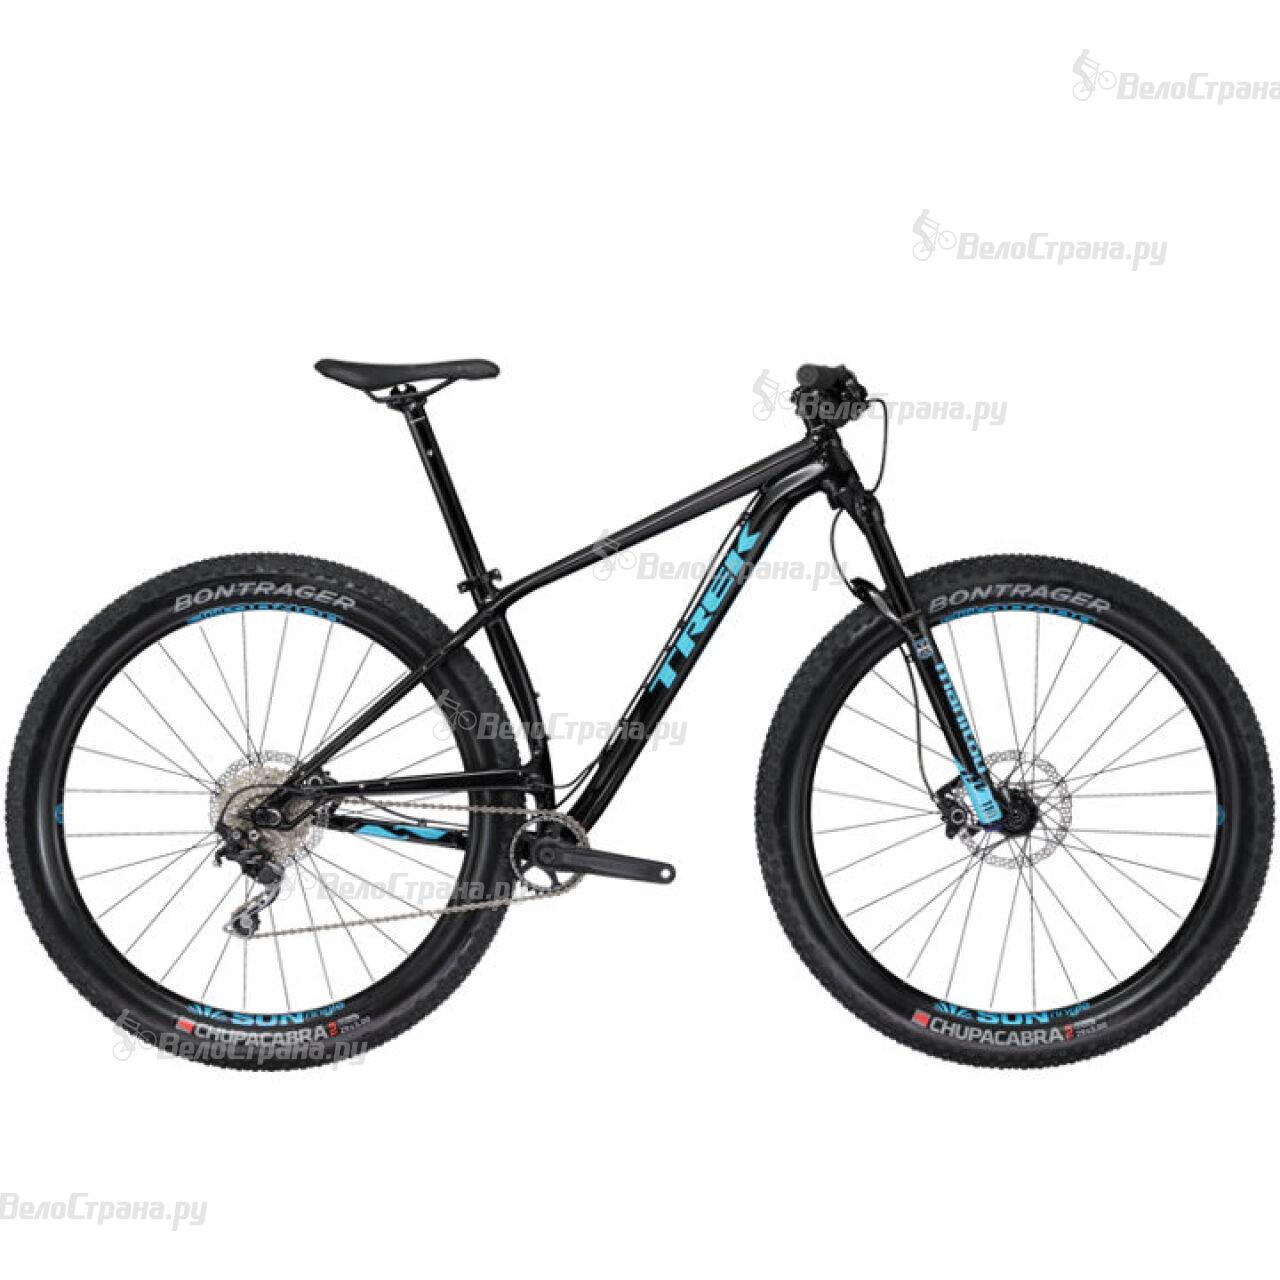 Велосипед Trek Stache 5 (2017) trek stache 7 2014